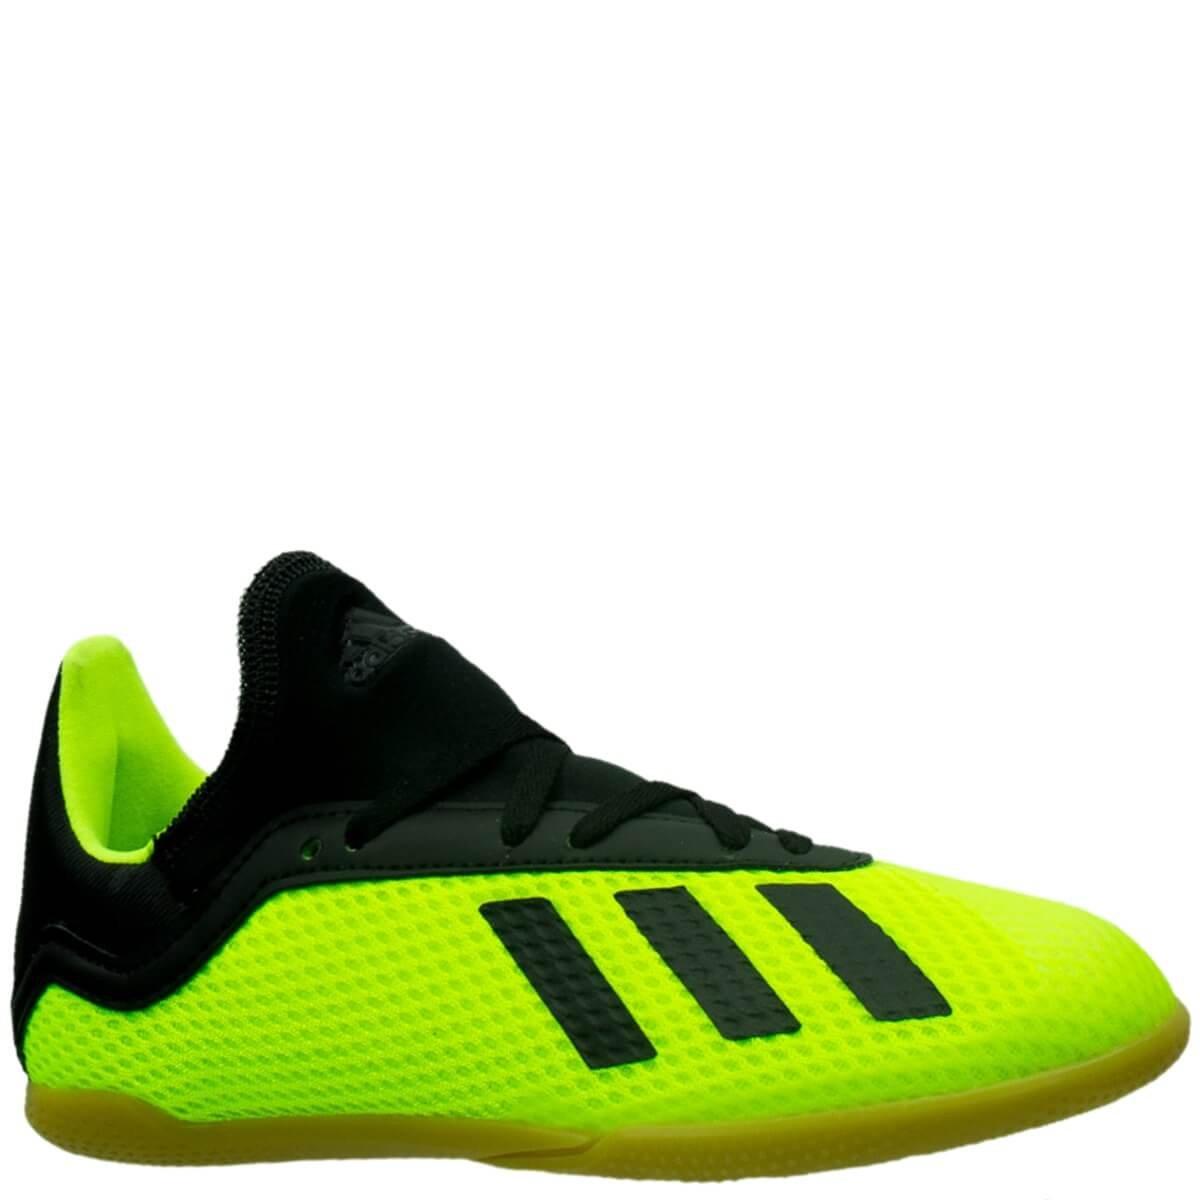 ba4536796c1b2 Chuteira Infantil Futsal Adidas X Tango 18.3 JR